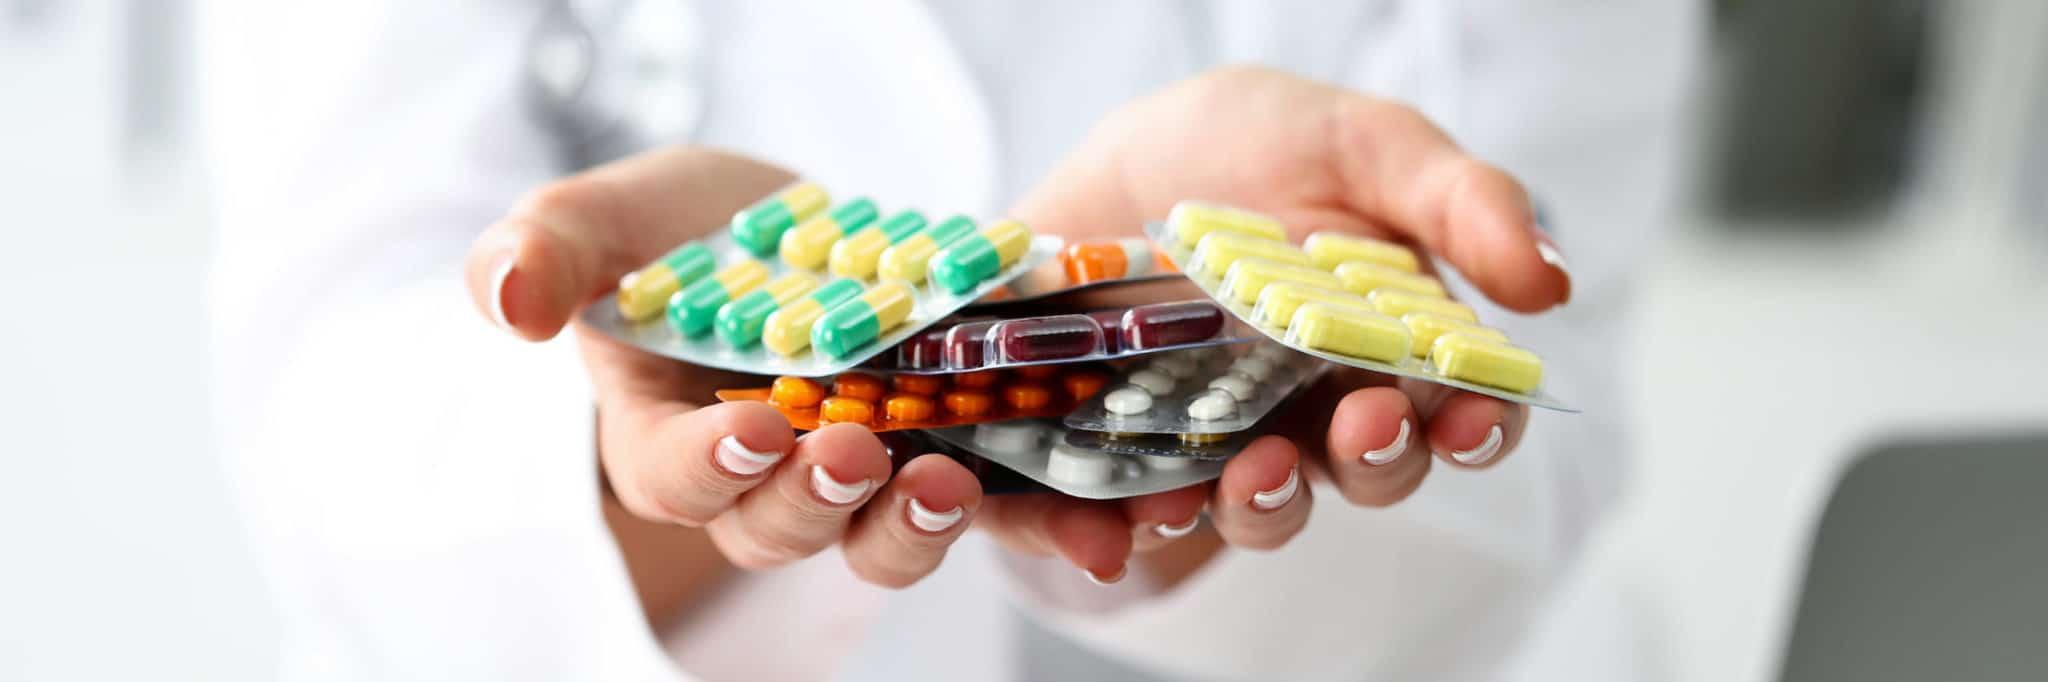 Apothekerin zeigt Tabletten